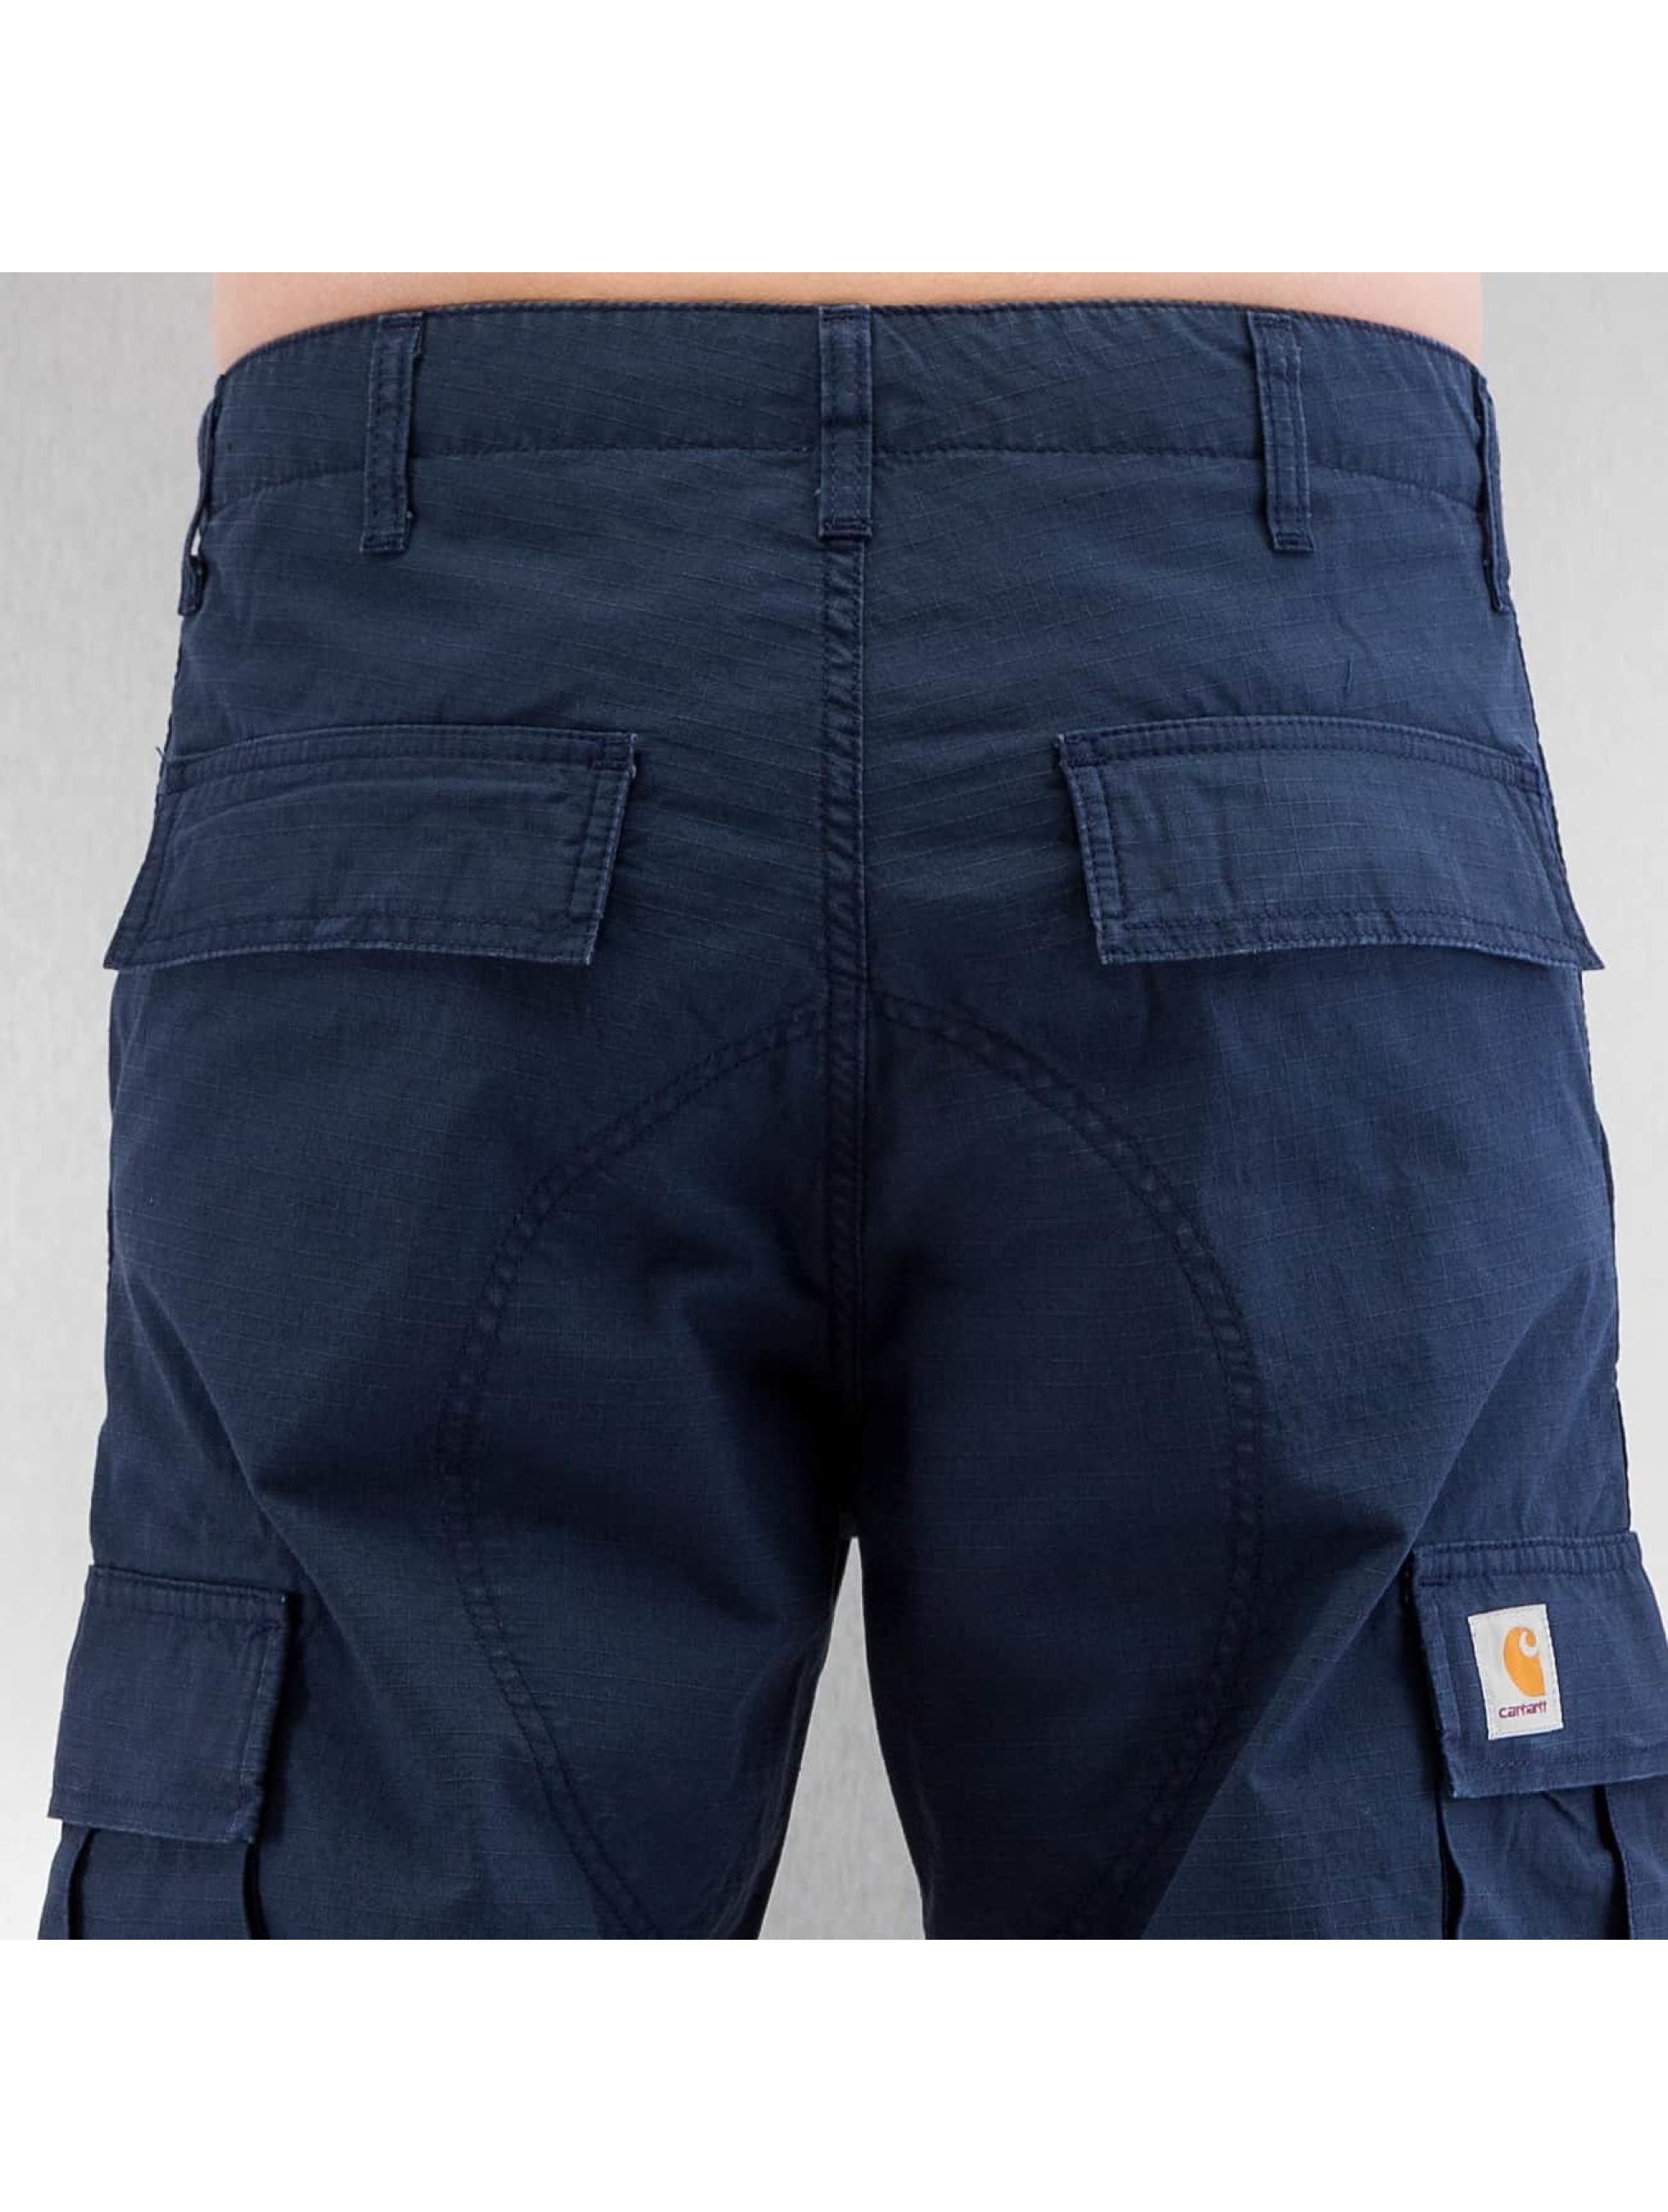 Carhartt WIP Cargo Regular blue